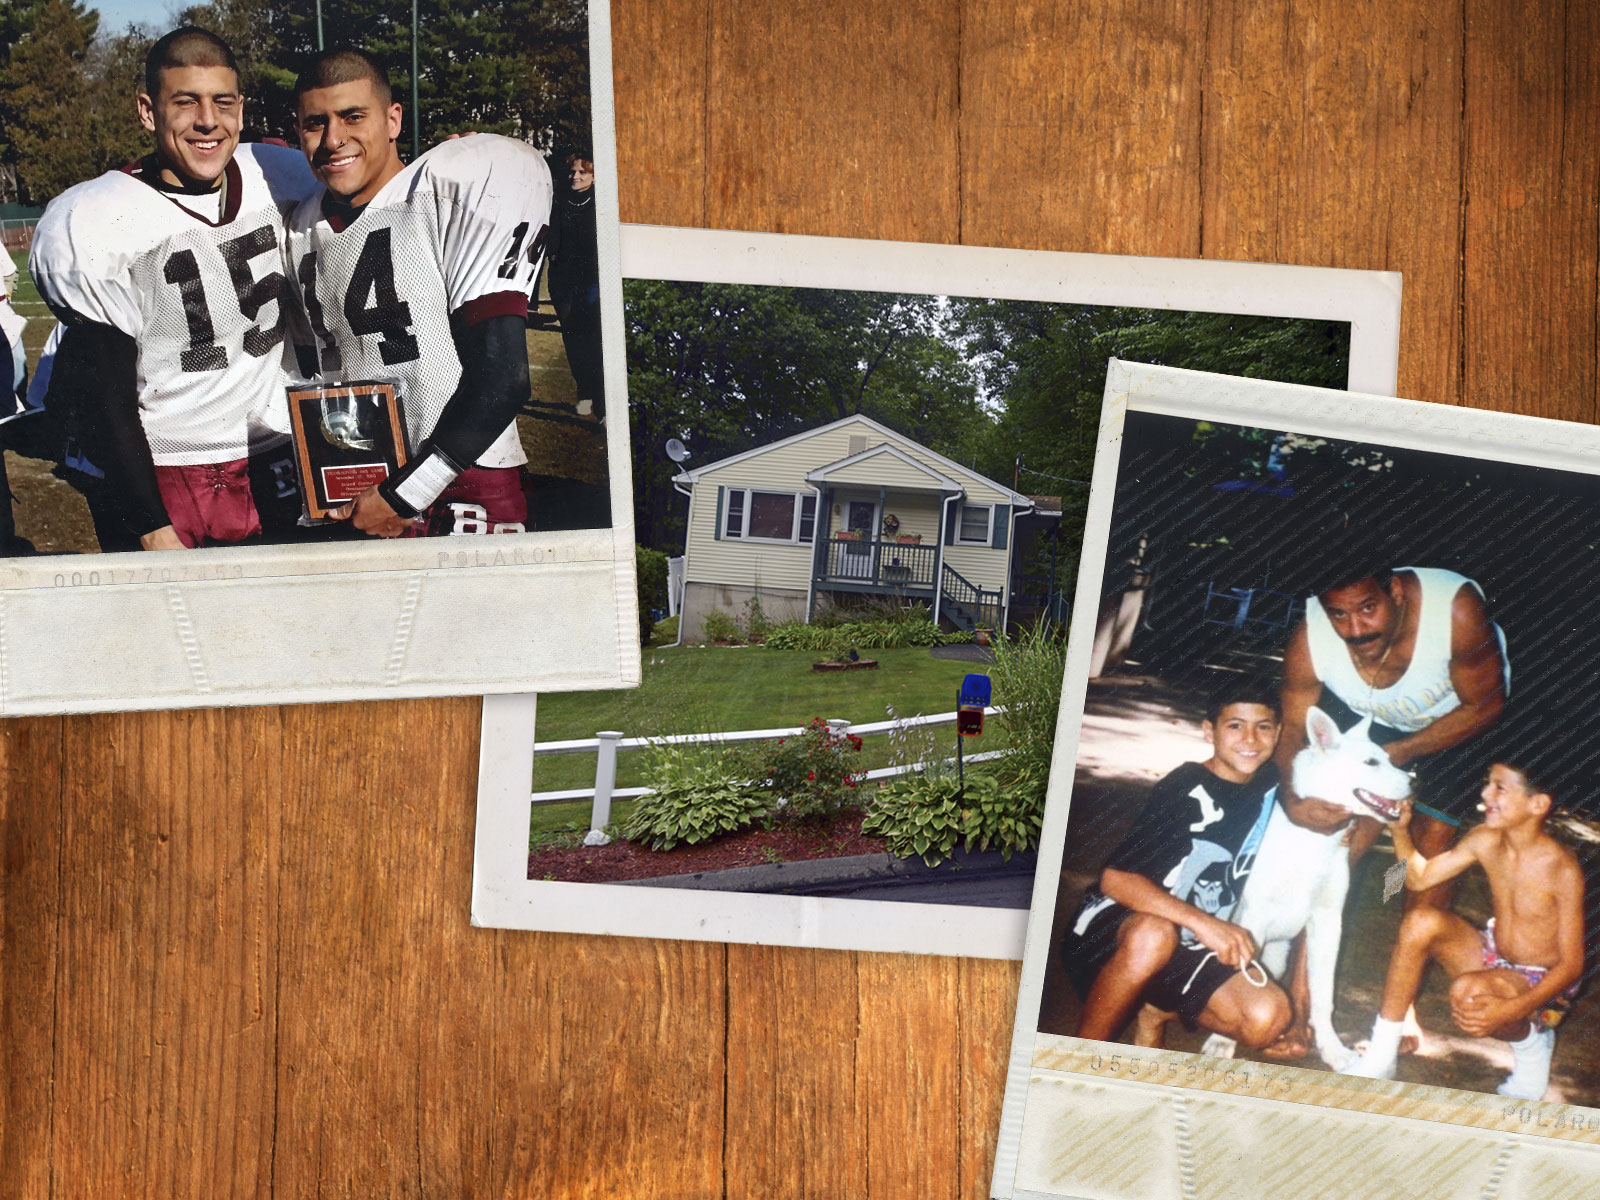 Aaron Hernandez S Brother Retraces Nfl Star S Path To